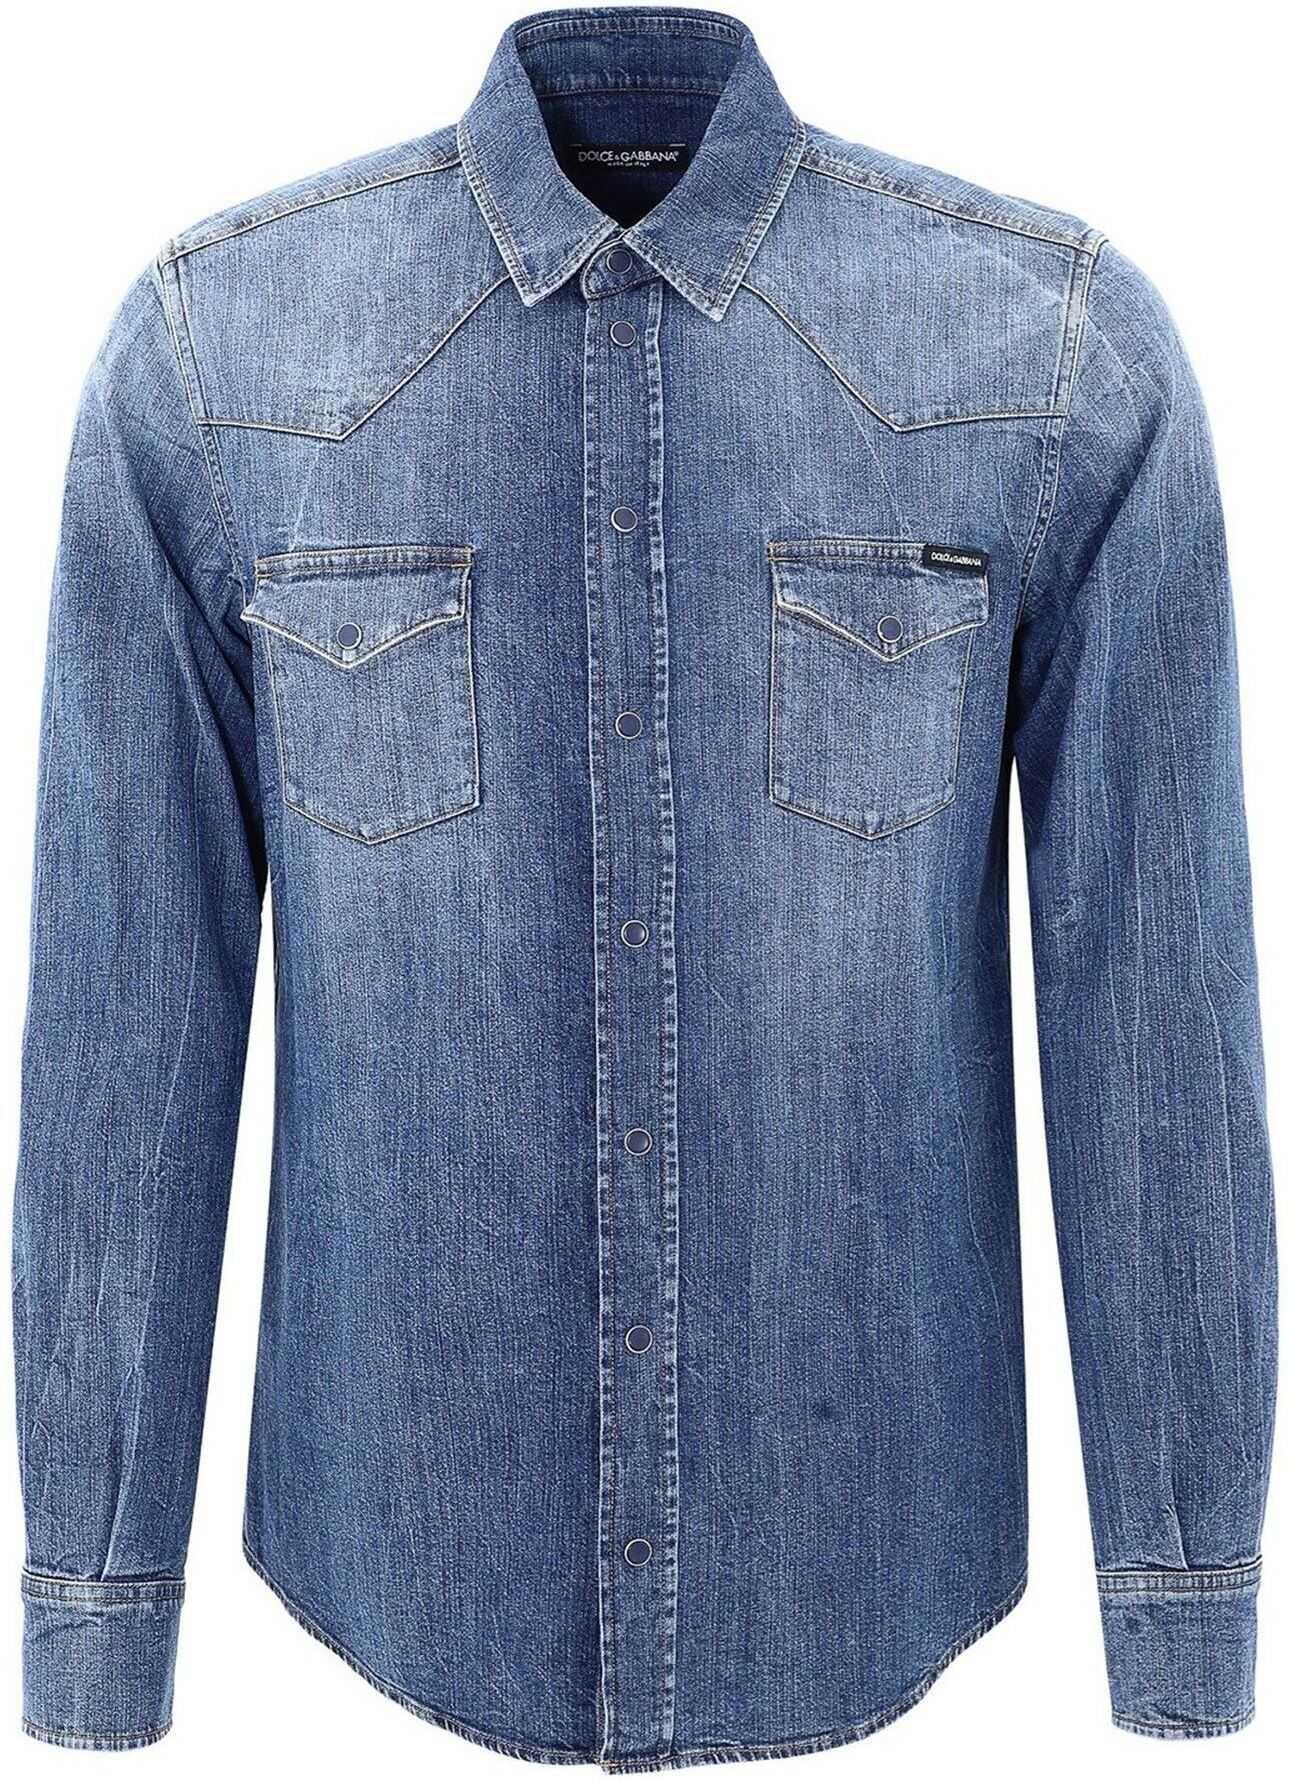 Dolce & Gabbana Denim Shirt In Blue Blue imagine